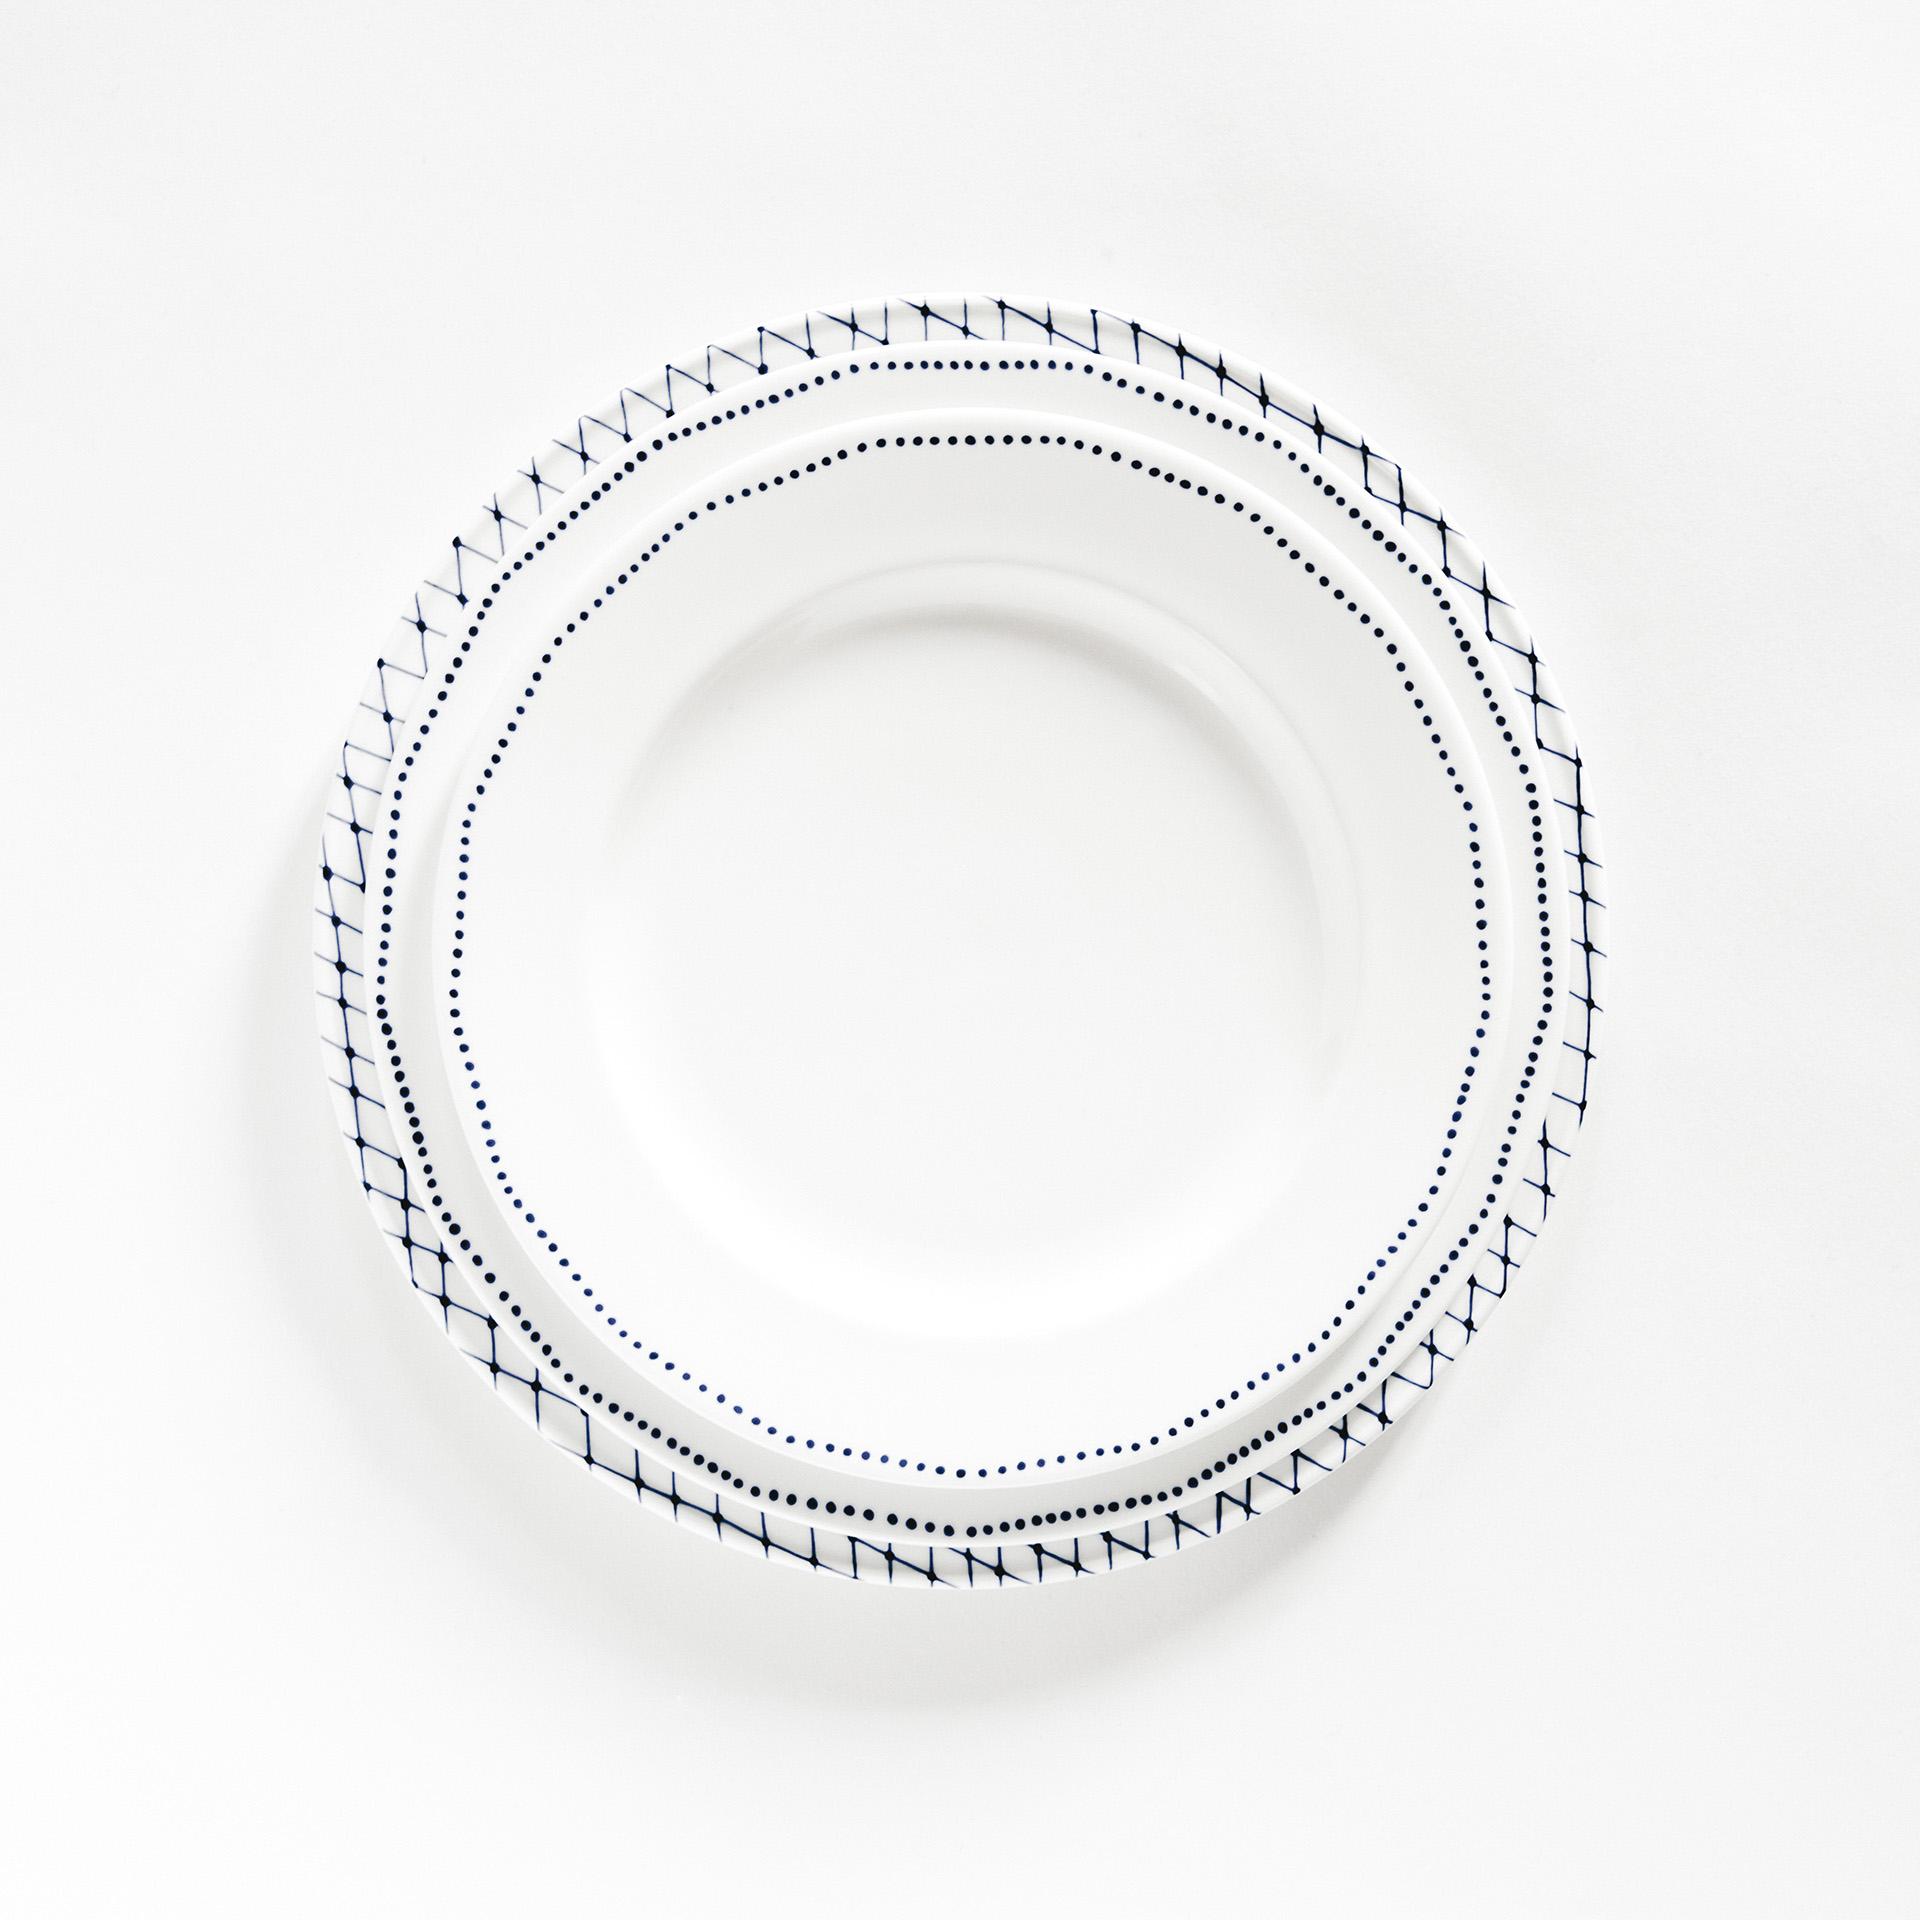 habby chic collection design piero lissoni